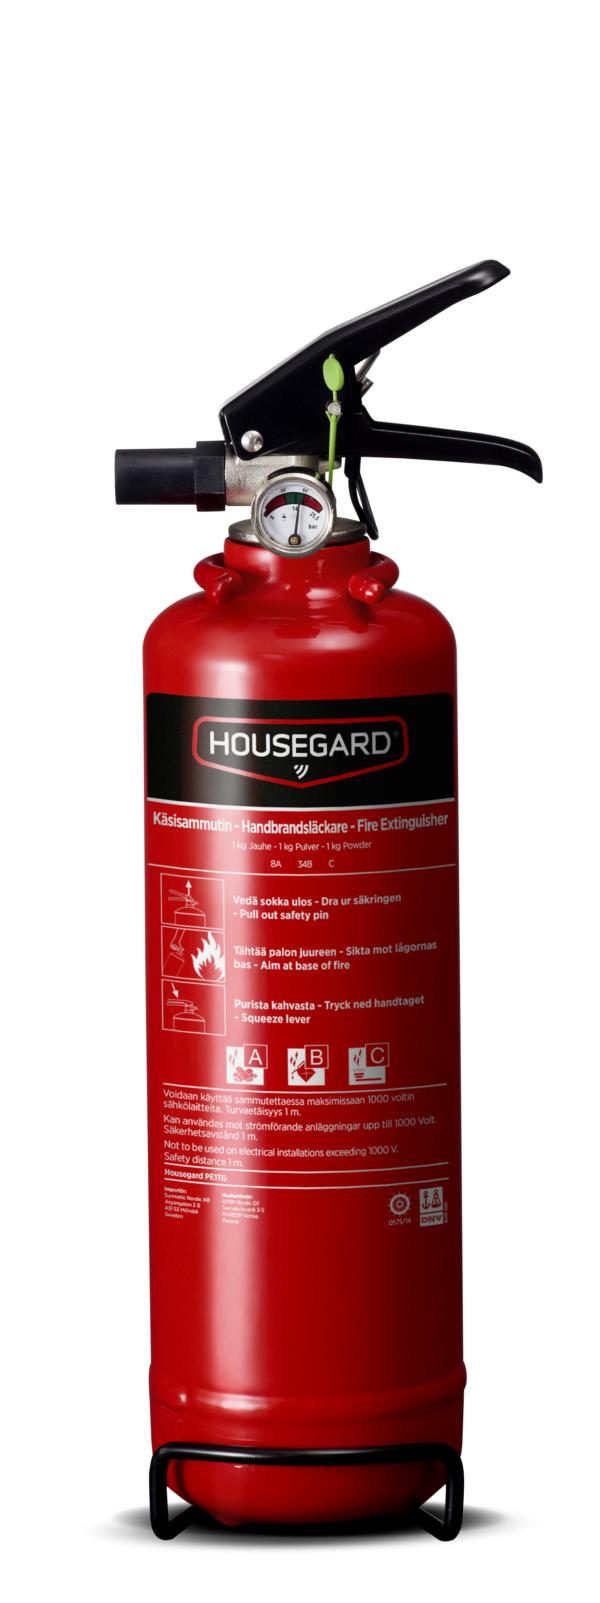 Housegard pulversläckare 1 kg